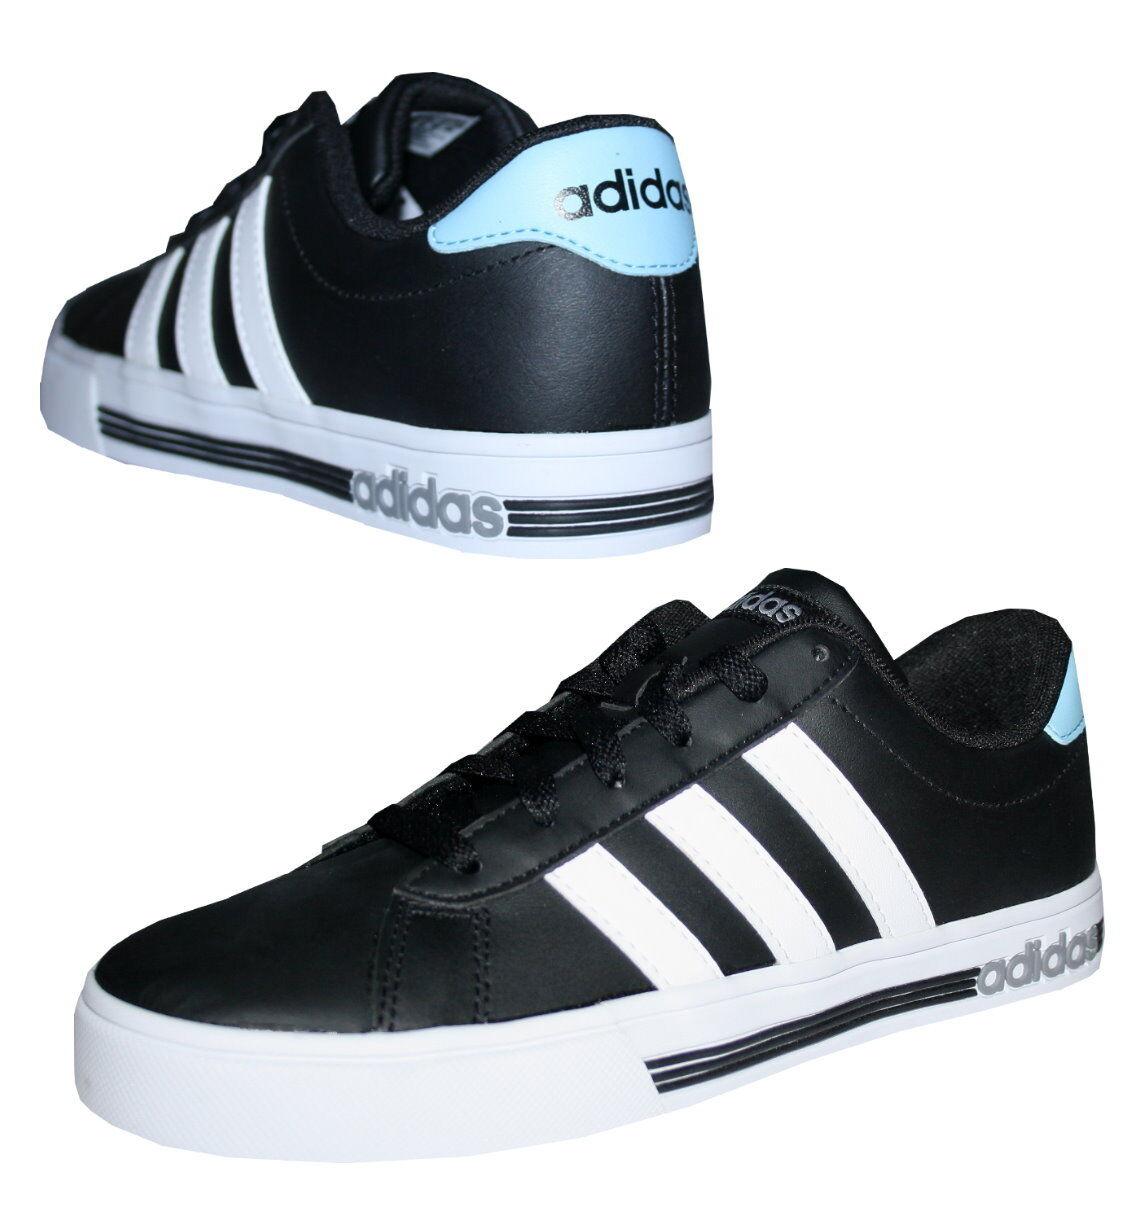 Adidas Neo Daily Team Sneaker Damen Herren Freizeitschuhe Schuhe schwarz Gr. 40